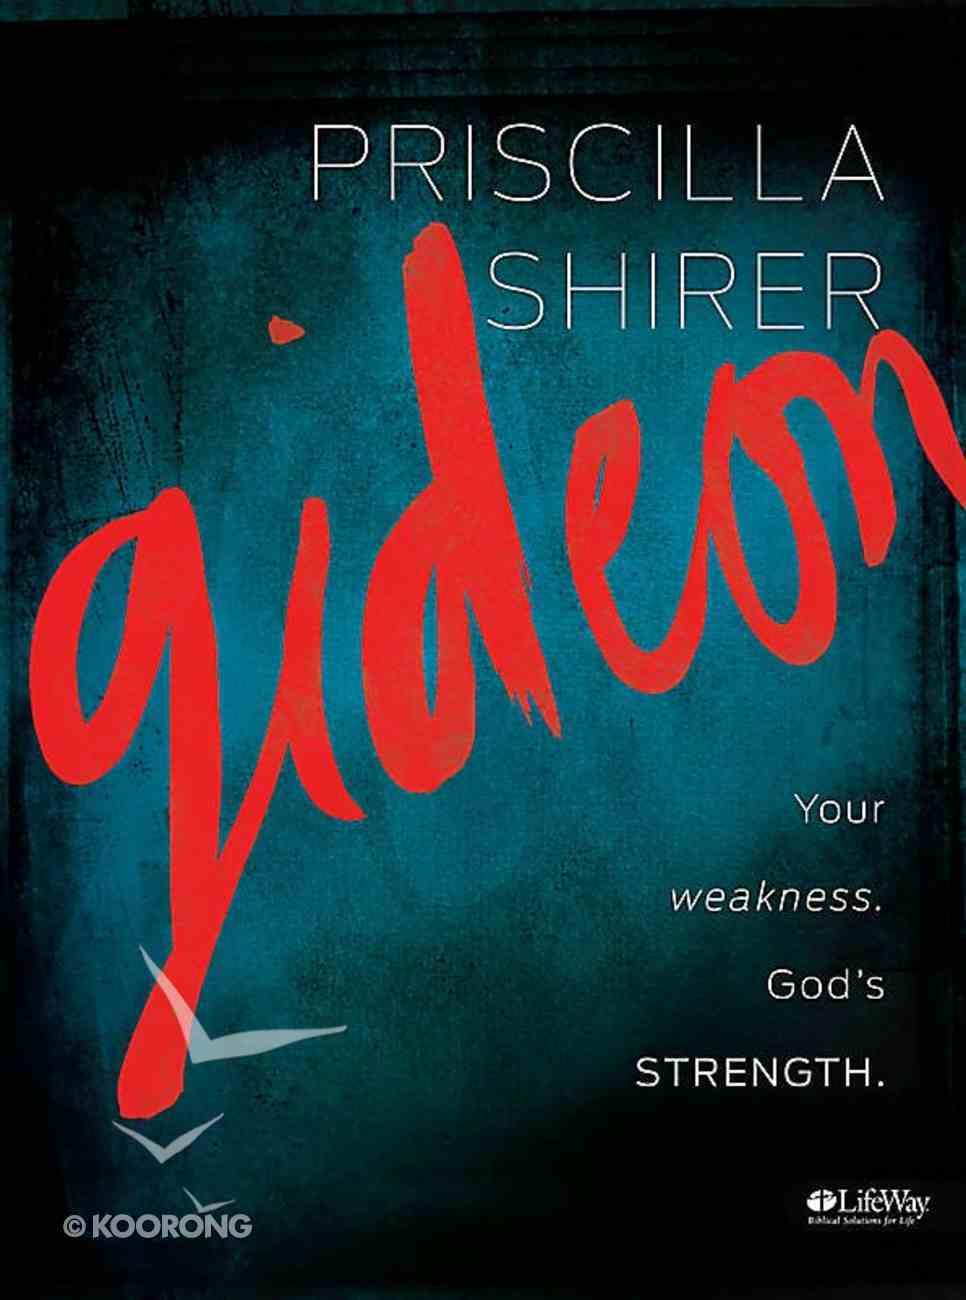 Gideon: Your Weakness, God's Strength (Leader Kit) Pack